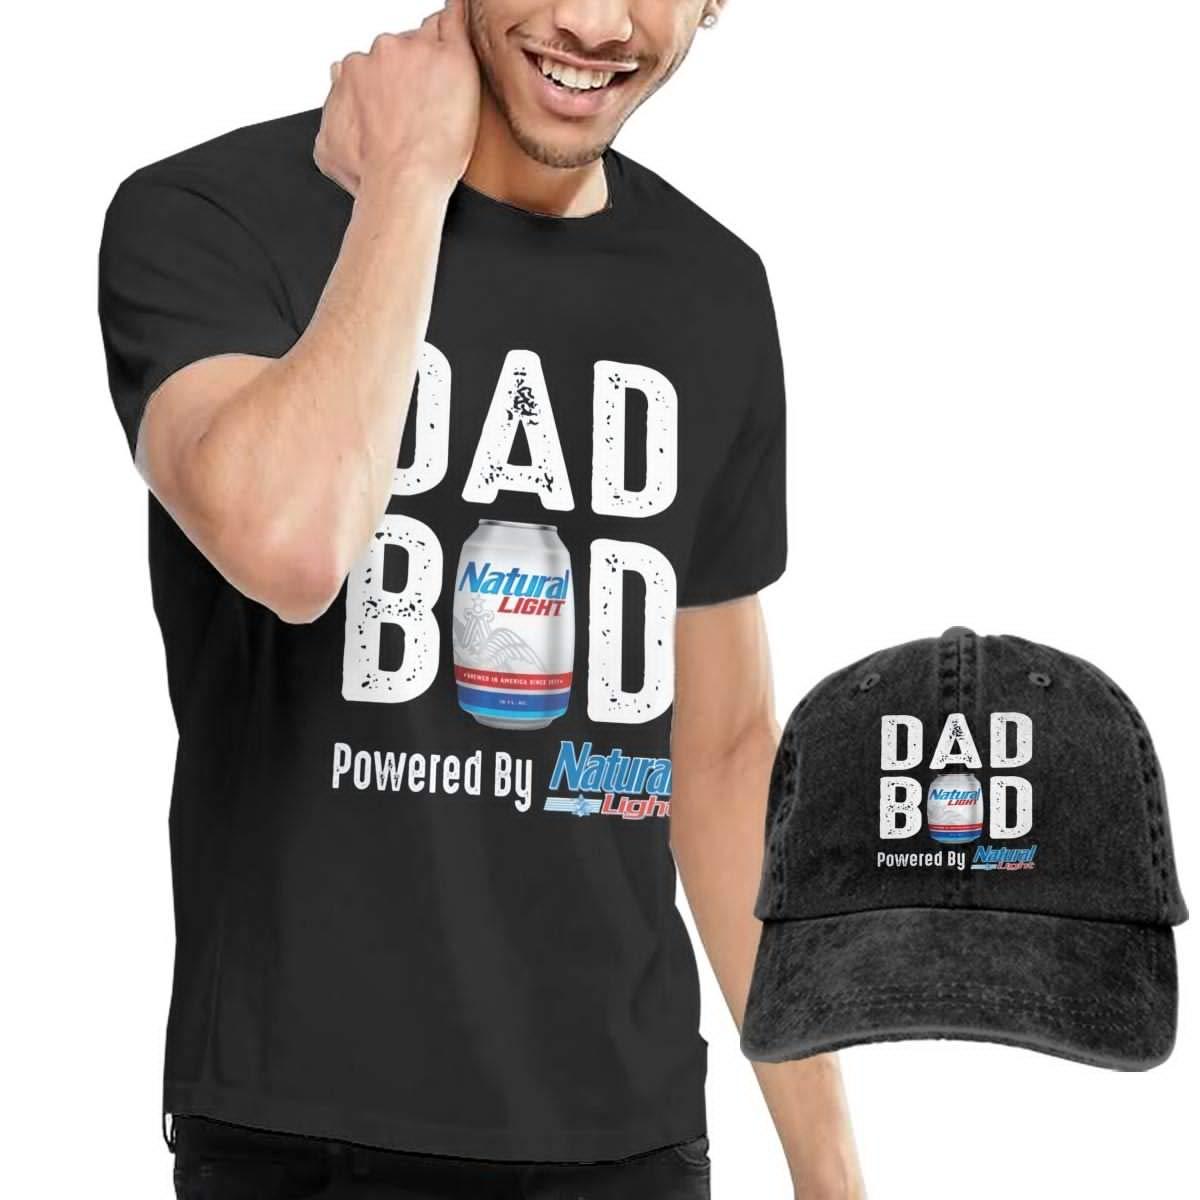 Hfusih.fhs6f789 Dad BOD Powered by Natural Light Adult Cap Adjustable Cowboys Hats Baseball Cap XL Black